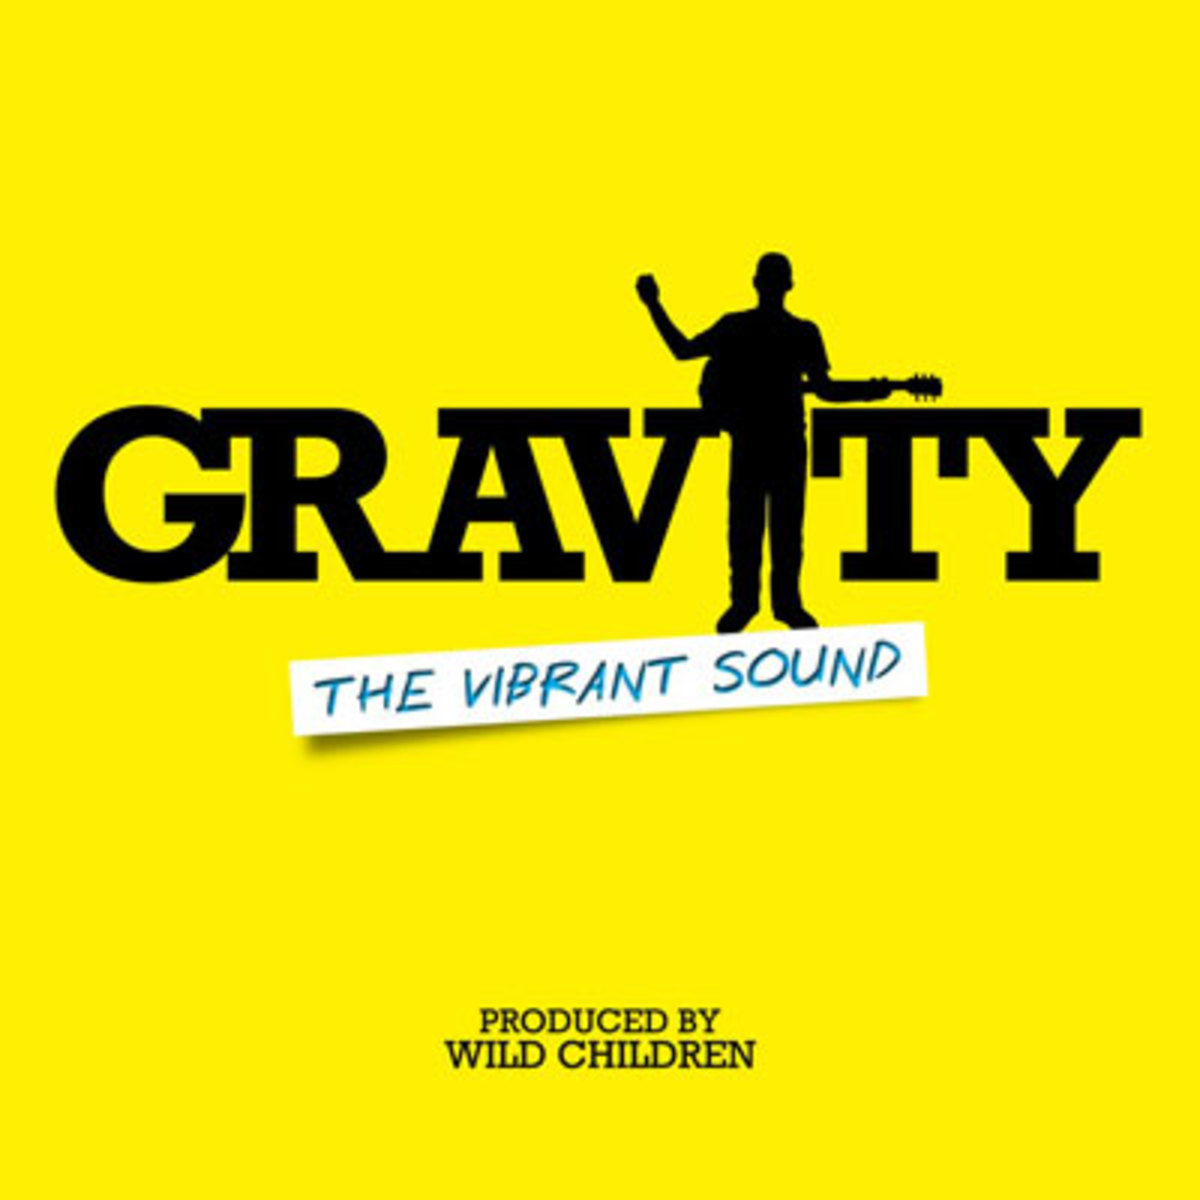 thevibrantsound-gravity.jpg